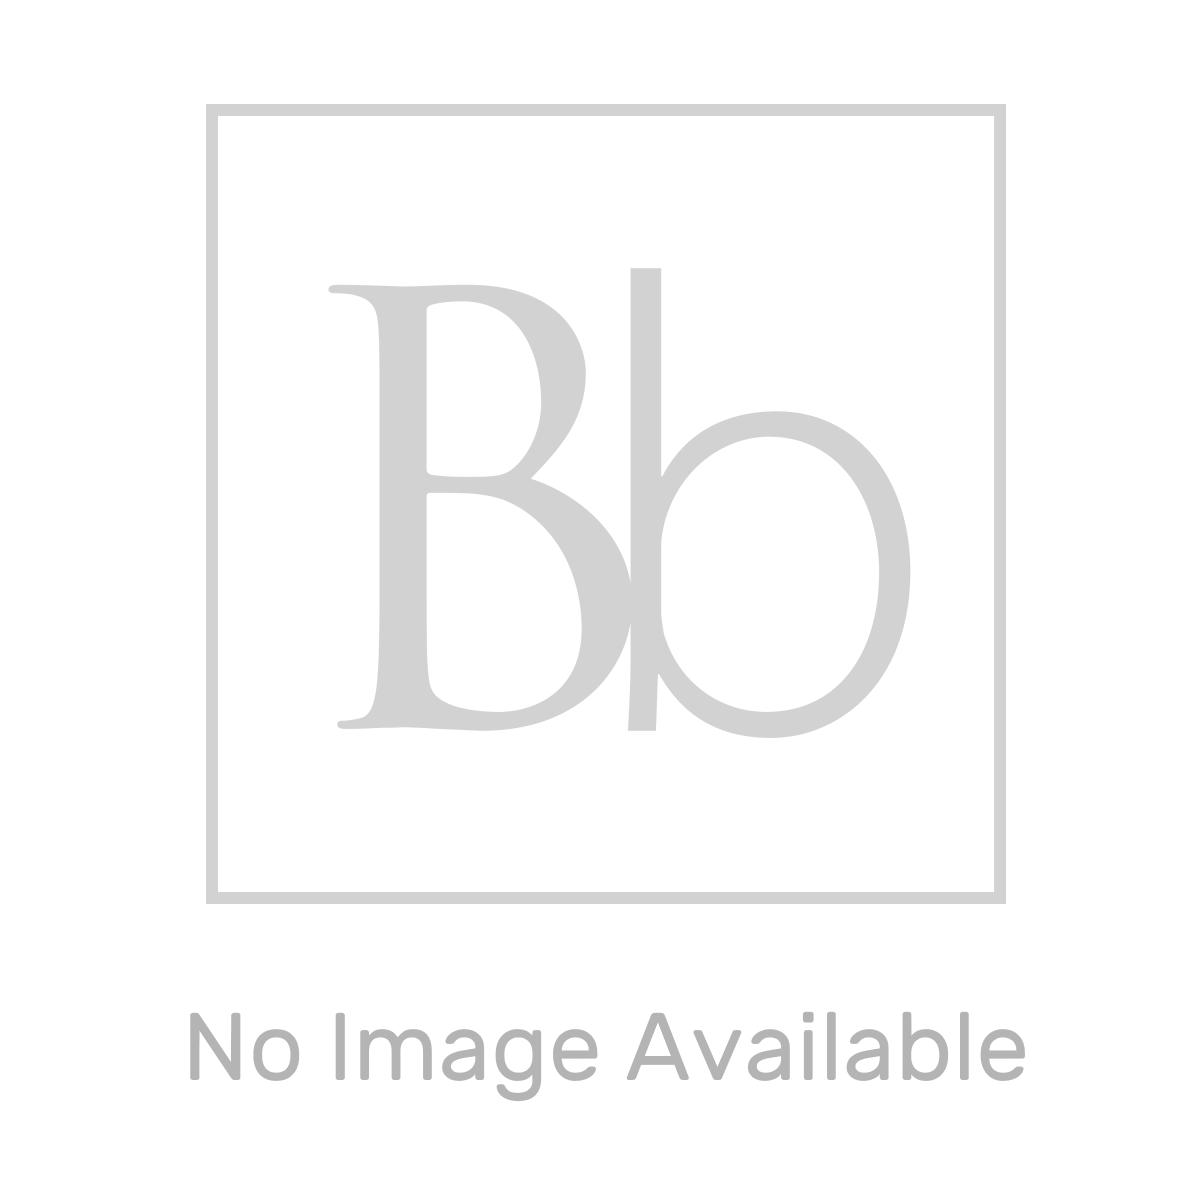 Burlington Matt White Freestanding Curved Vanity Unit 1340mm Carrara White